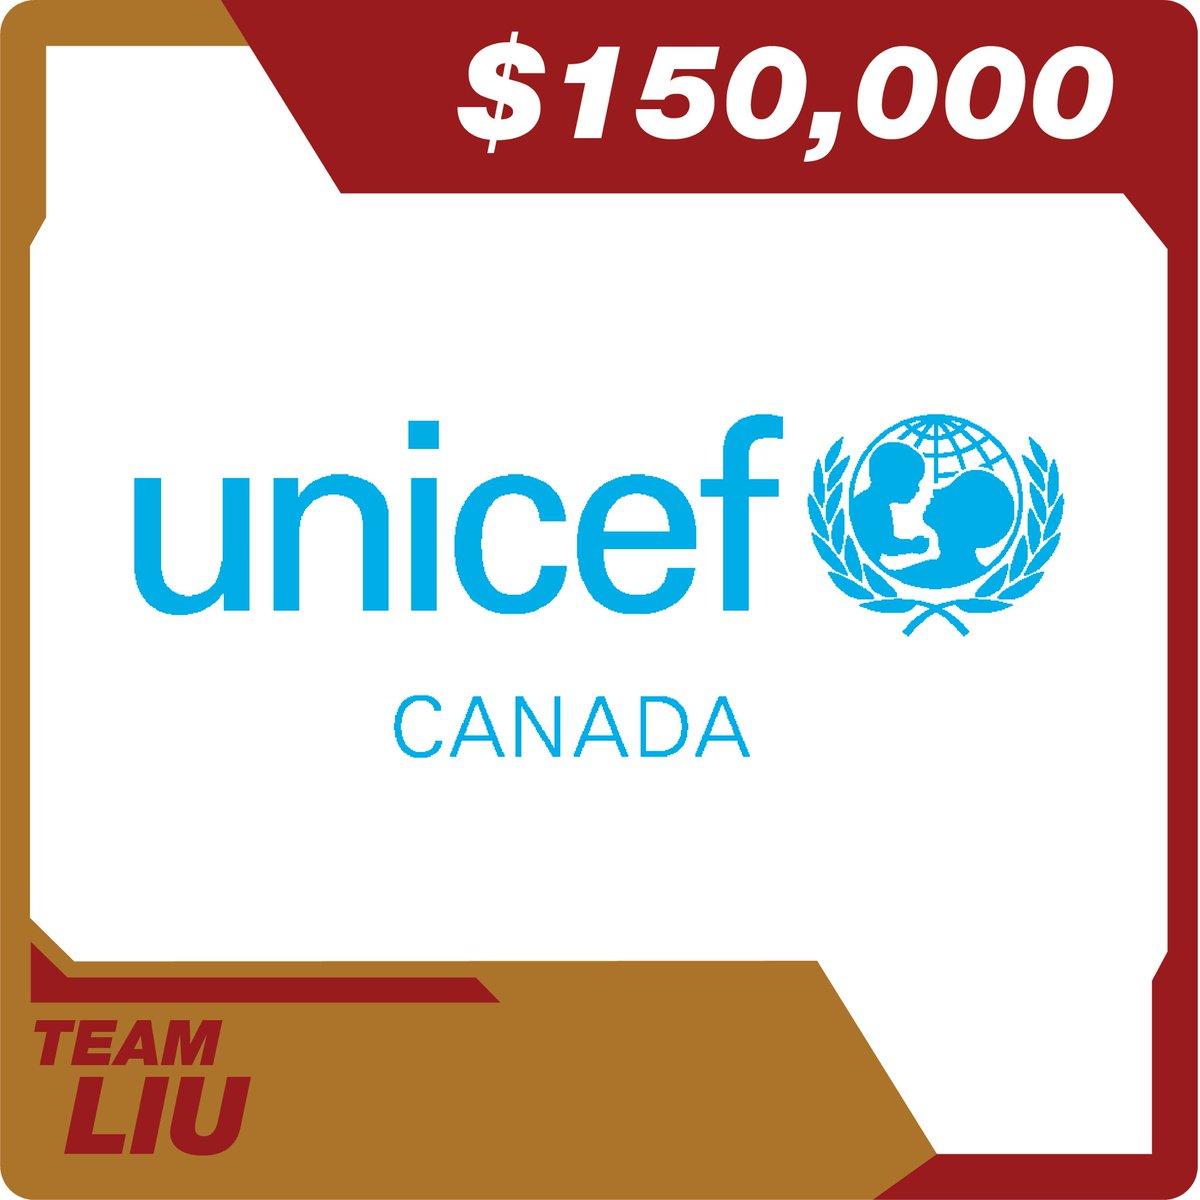 #TeamLiu @SimuLiu @UNICEFCanada